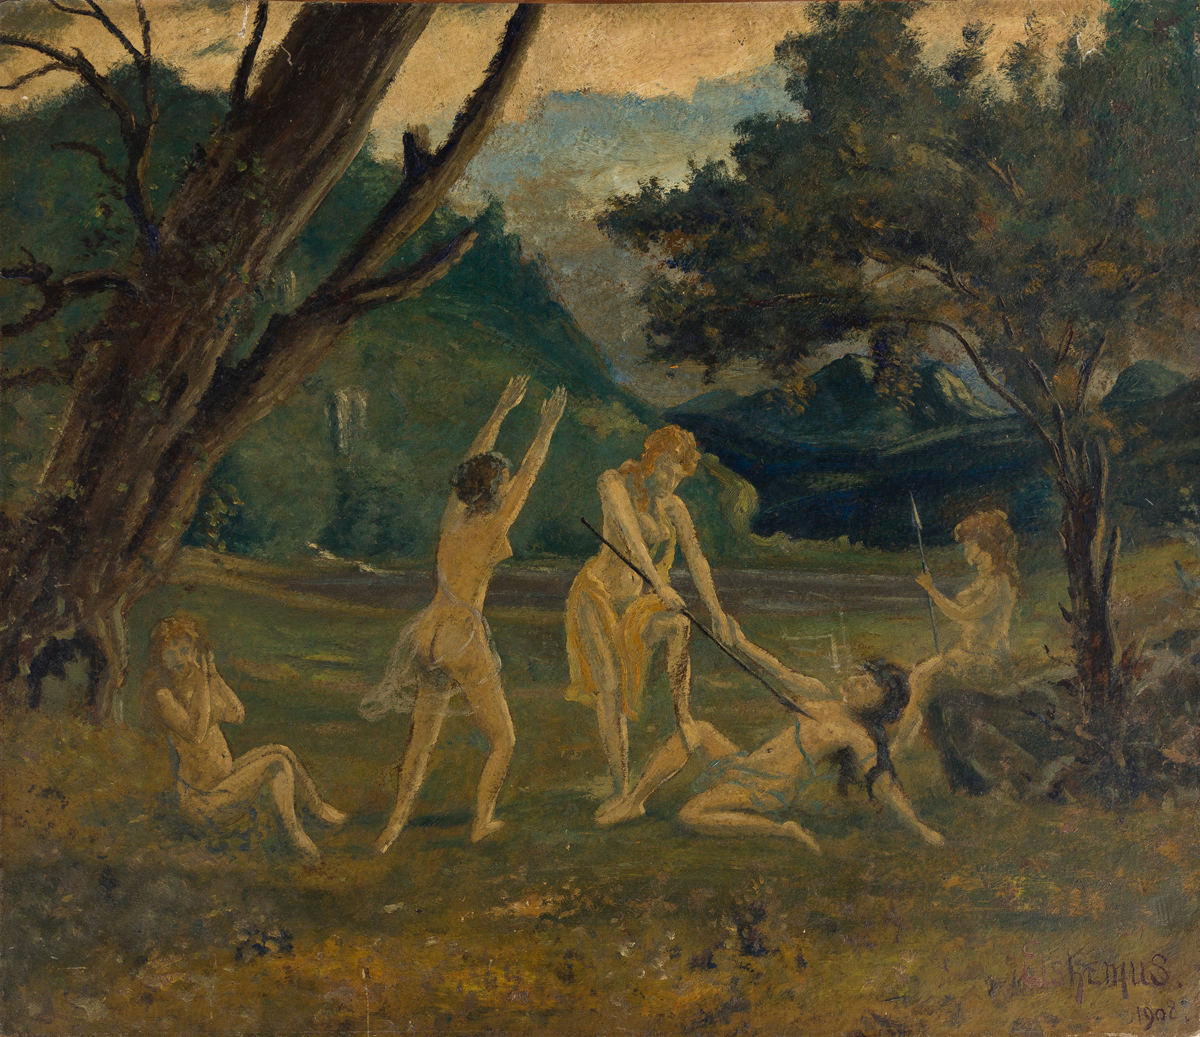 LOUIS EILSHEMIUS Landscape with Playful Nymphs.